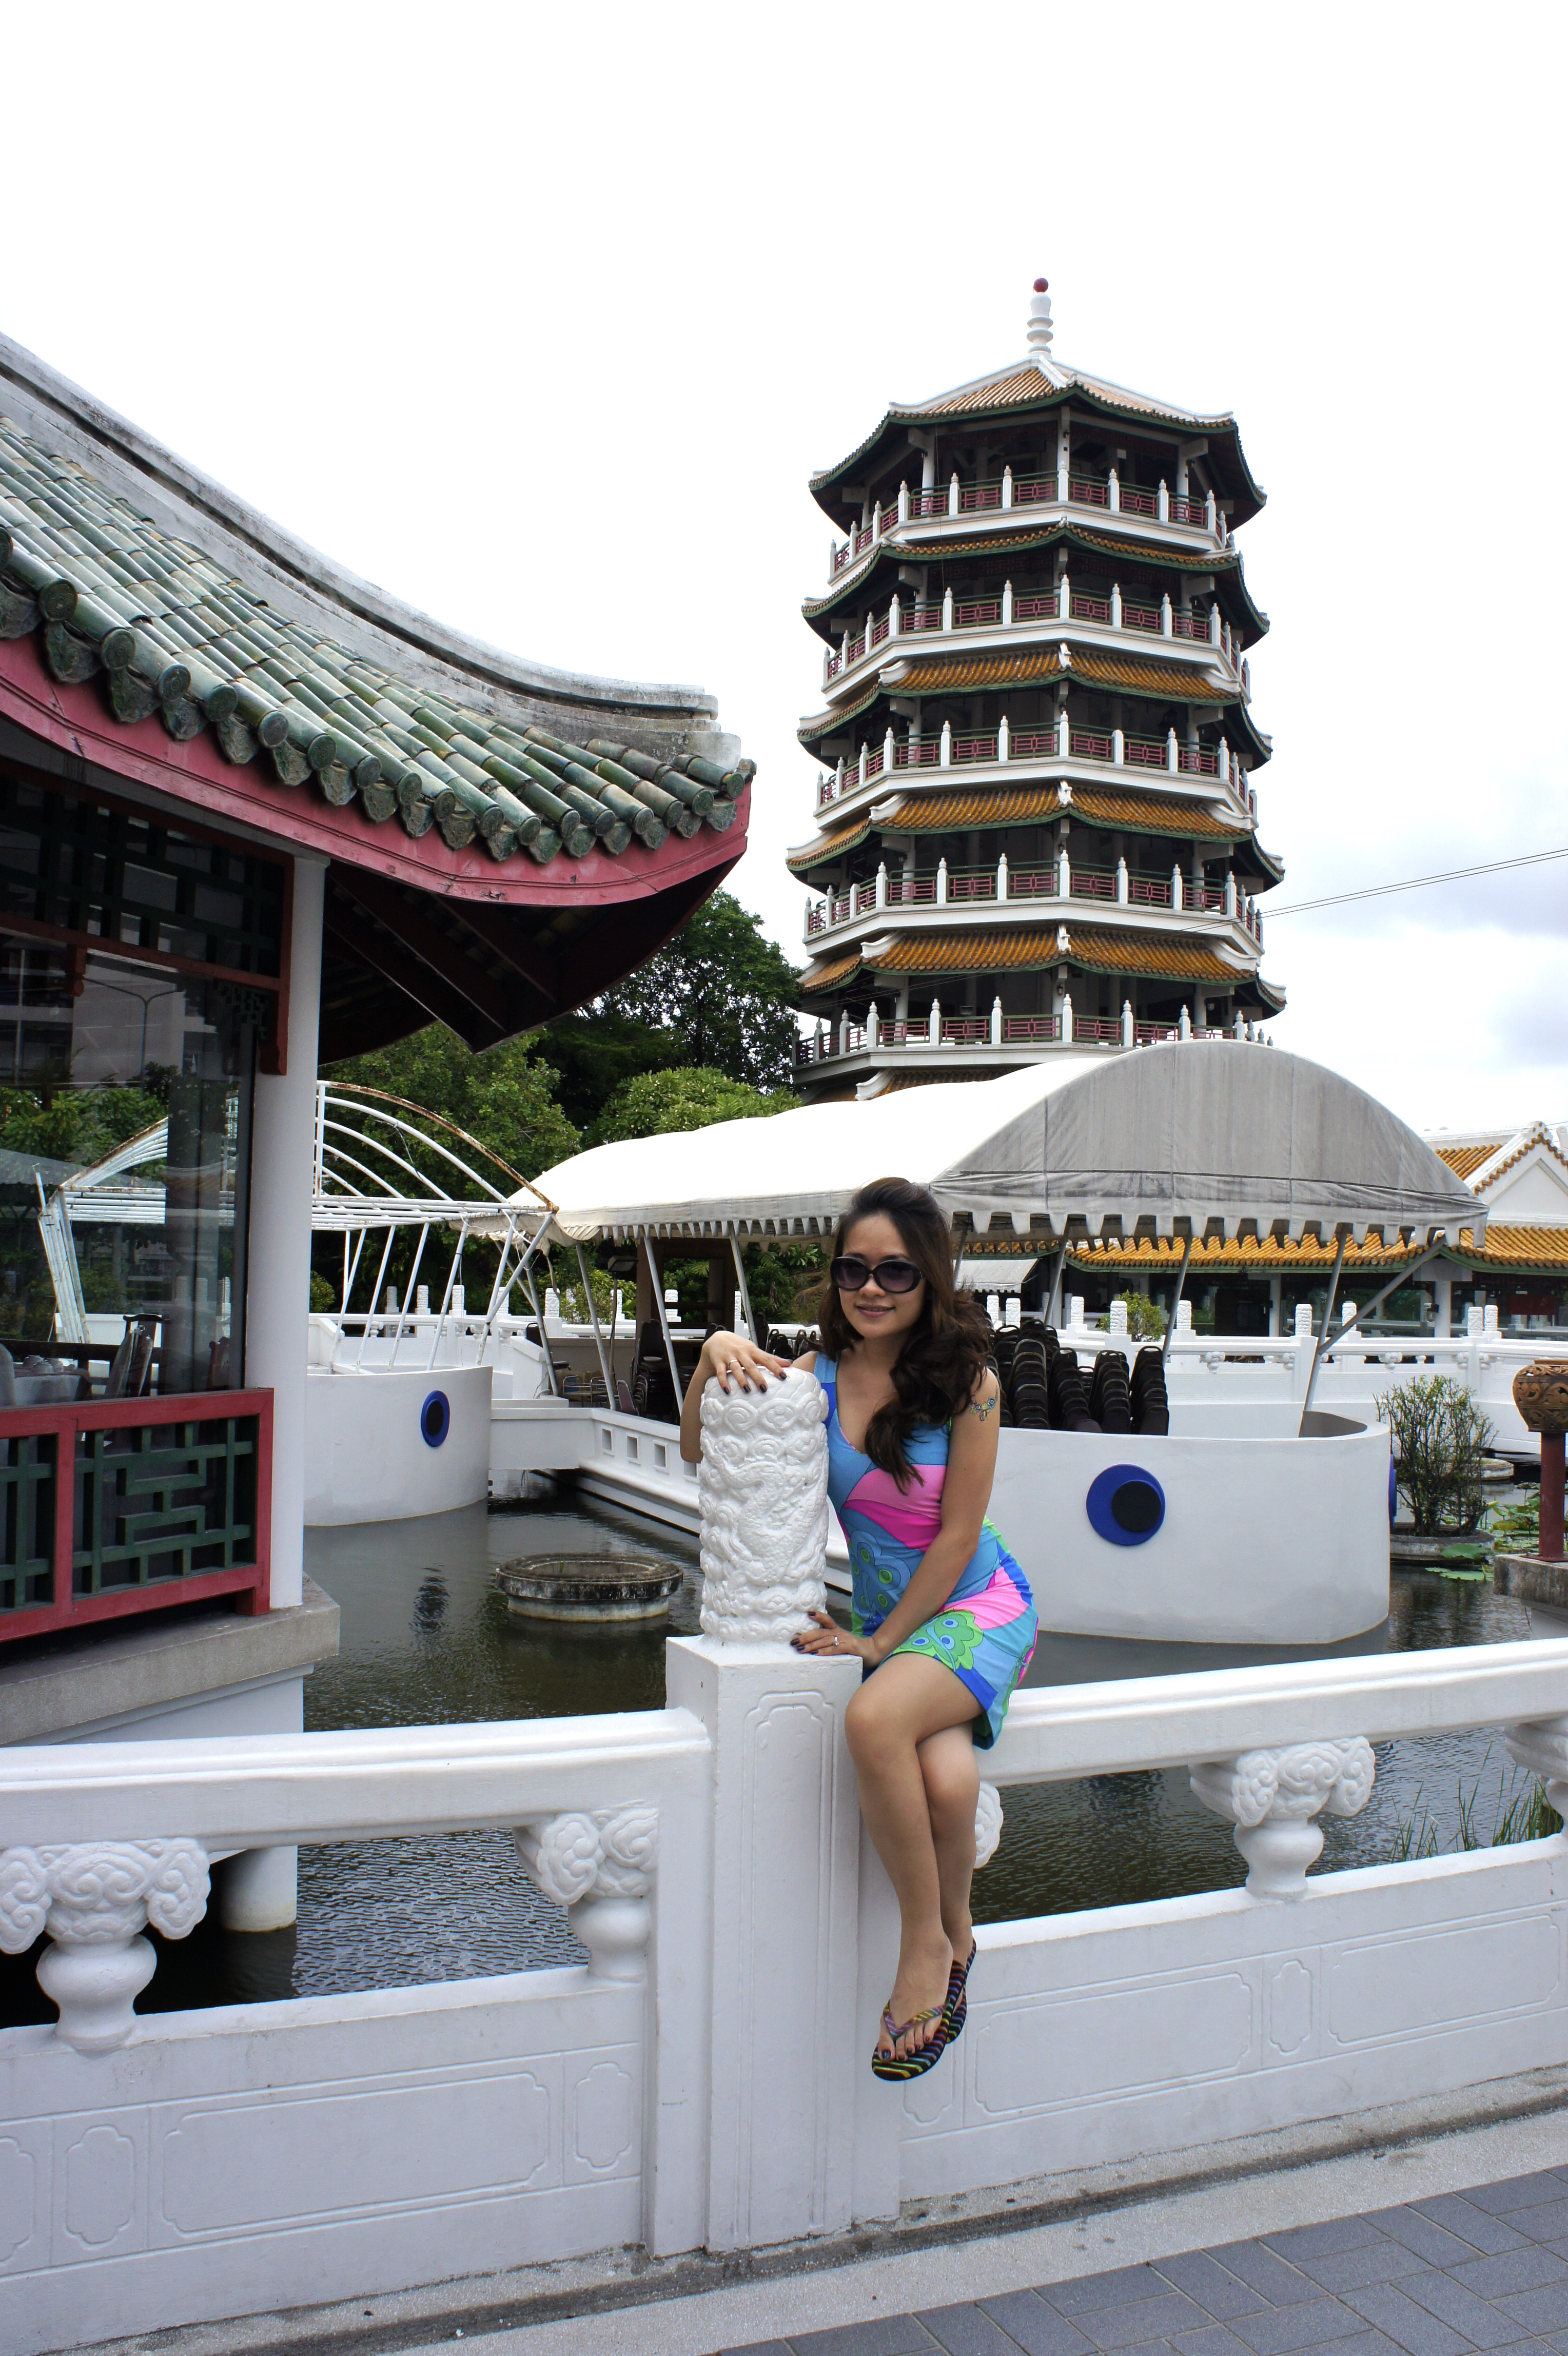 Beauty and Land, Beauty, Bridge, Tower, Woman, HQ Photo